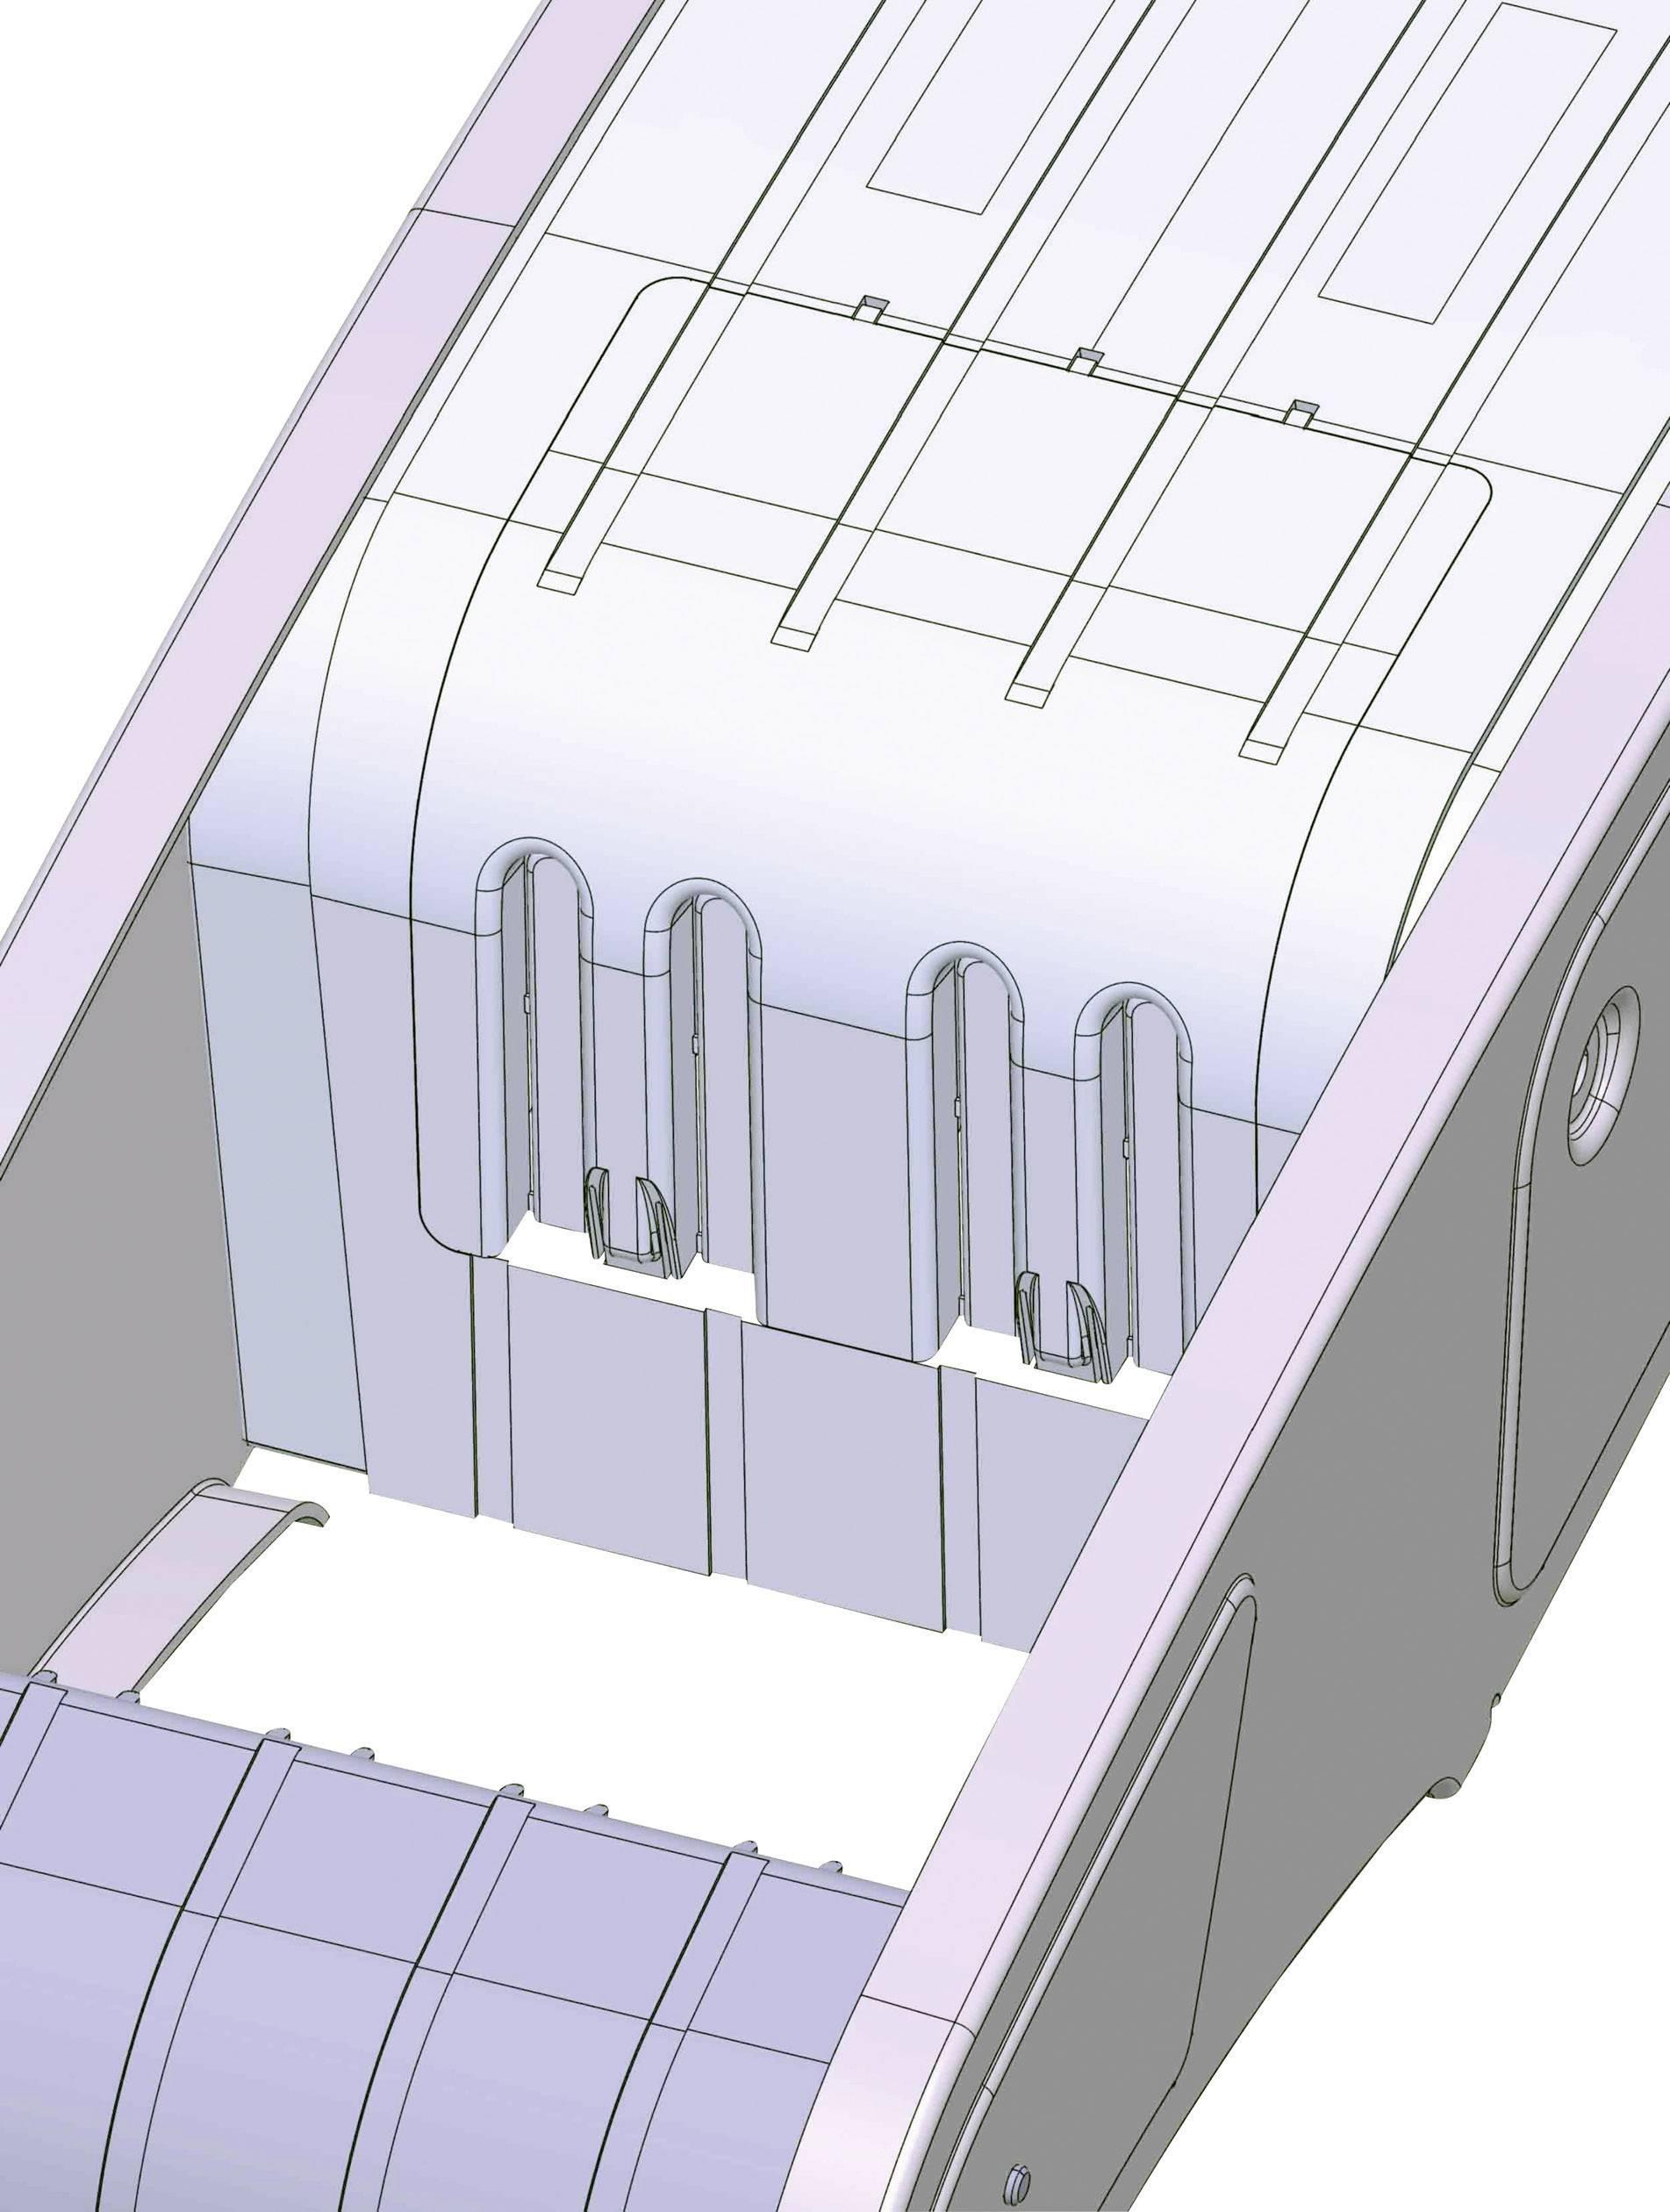 Satelitní anténa, Fuba DAA 850 G, 85 cm, světle šedá